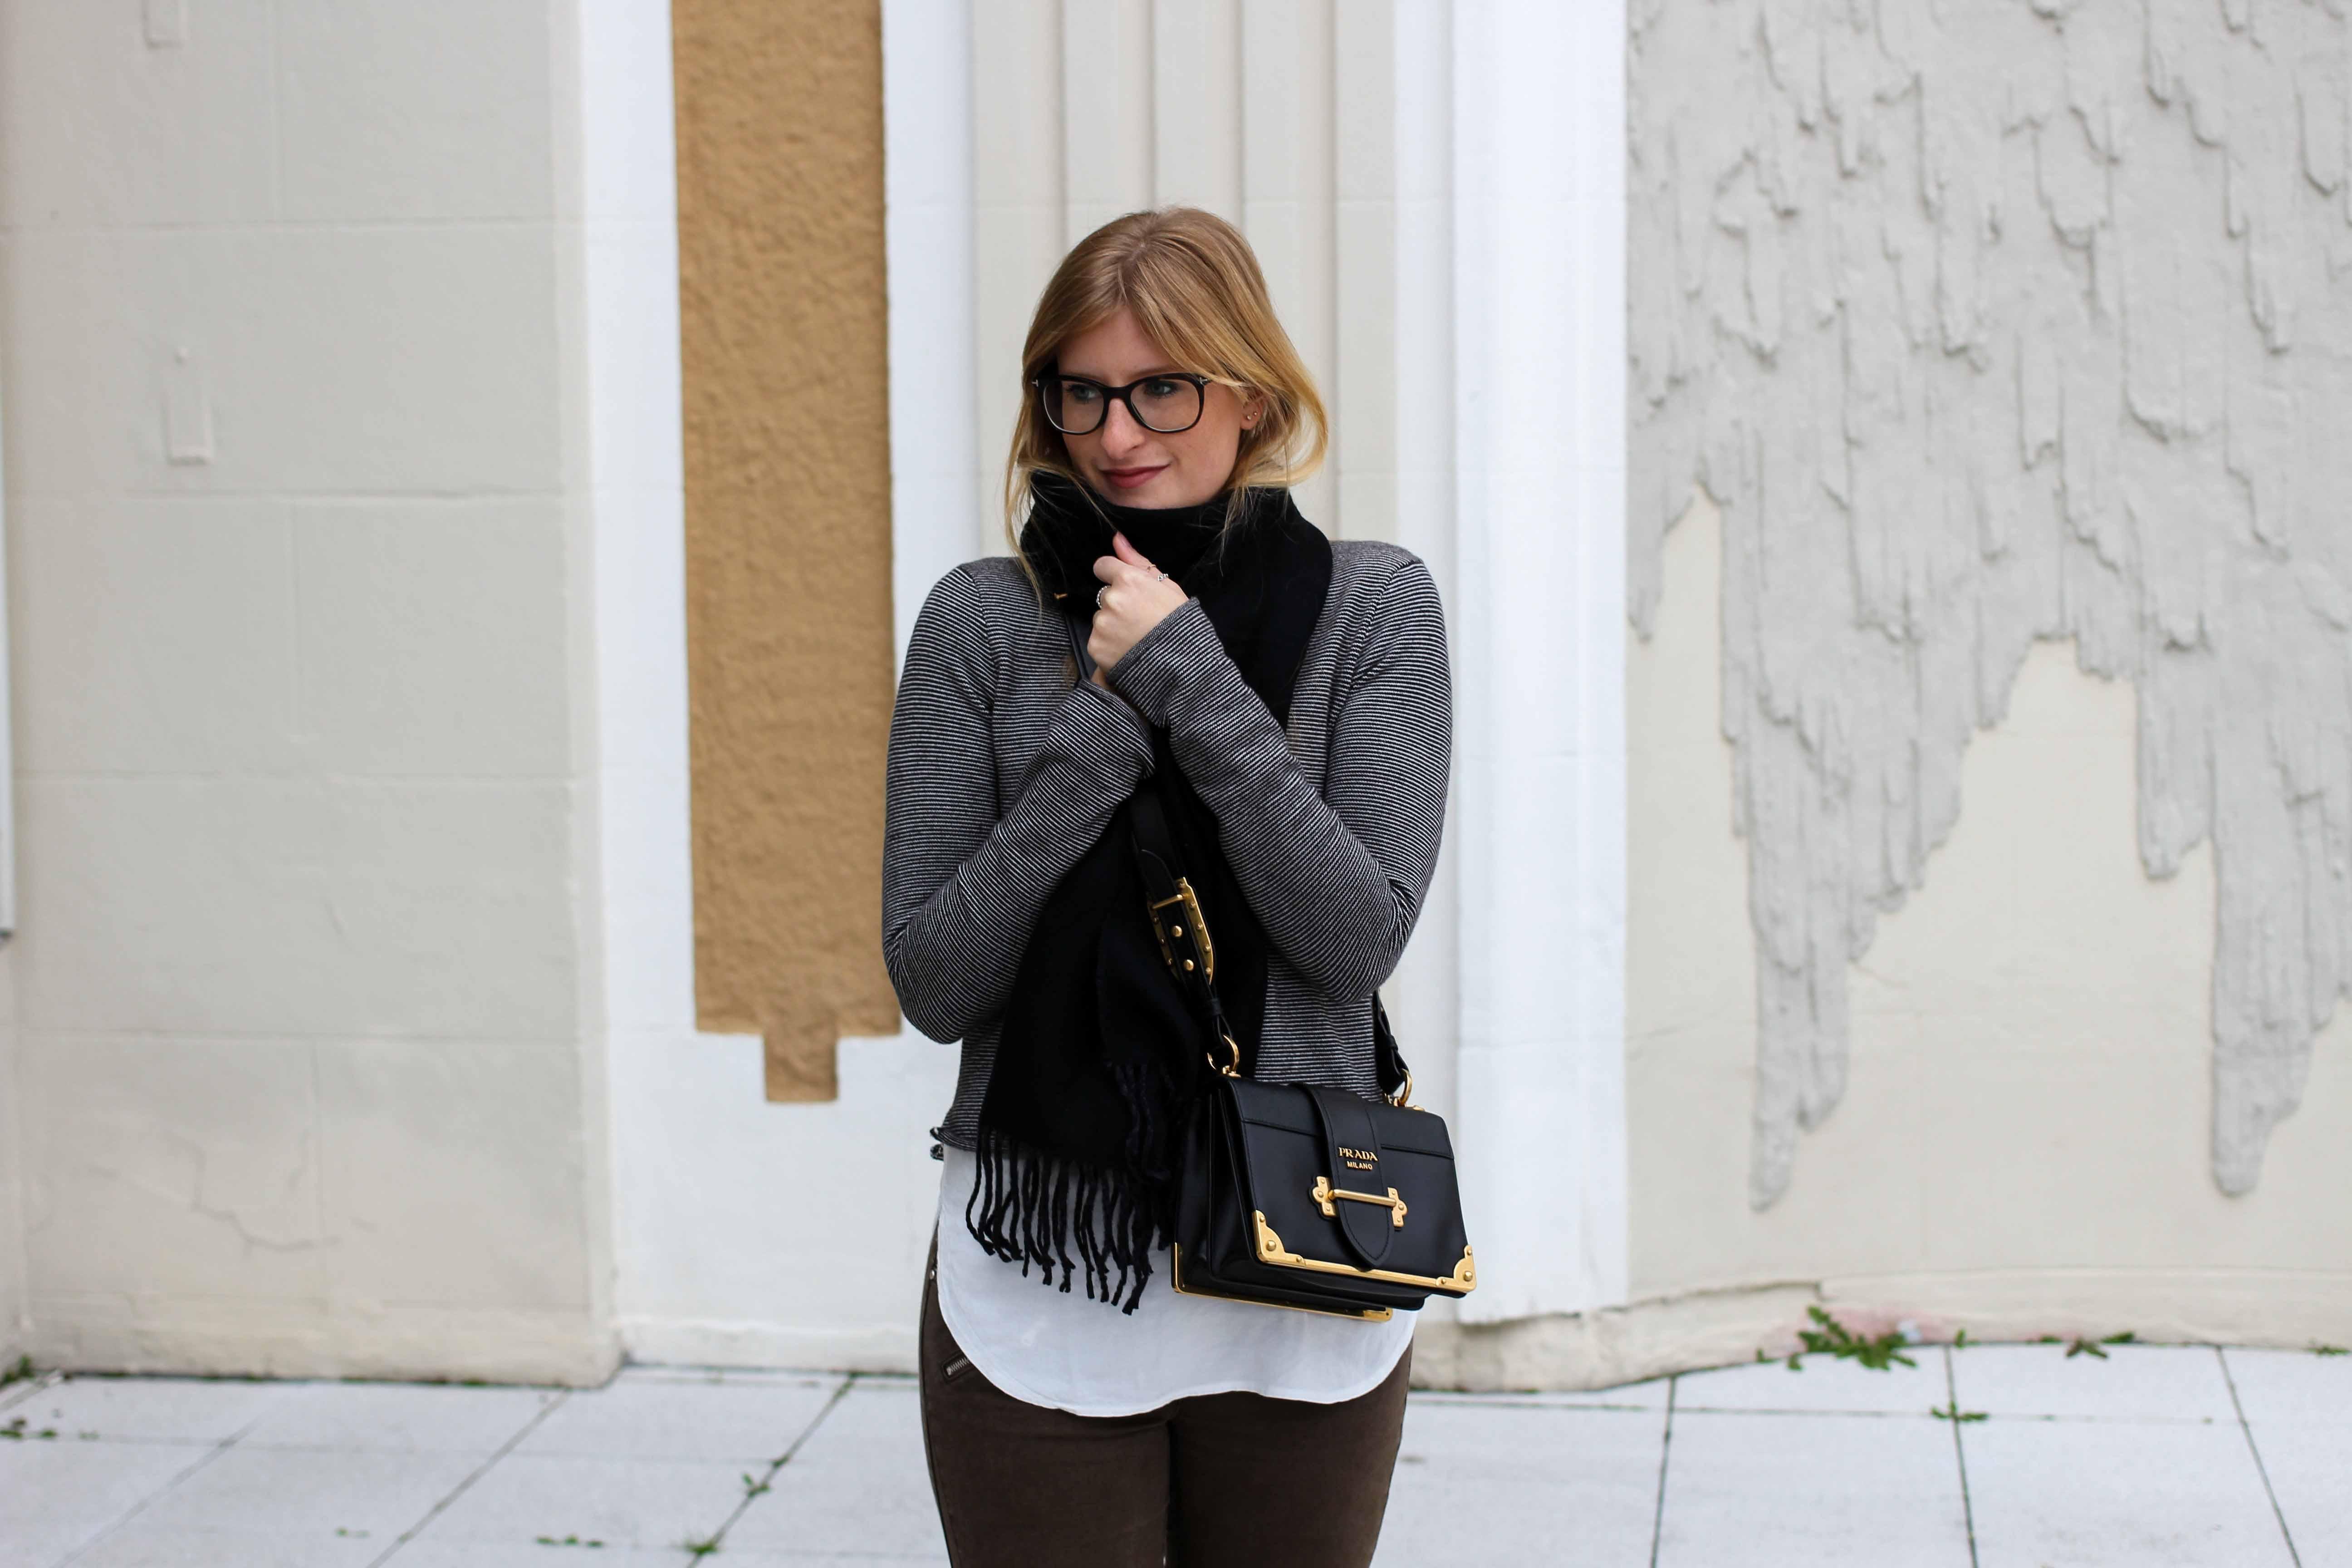 Casual OOTD Look Zara Pullover Schal Winteroutfit Prada Tasche schwarz Modeblogger 6